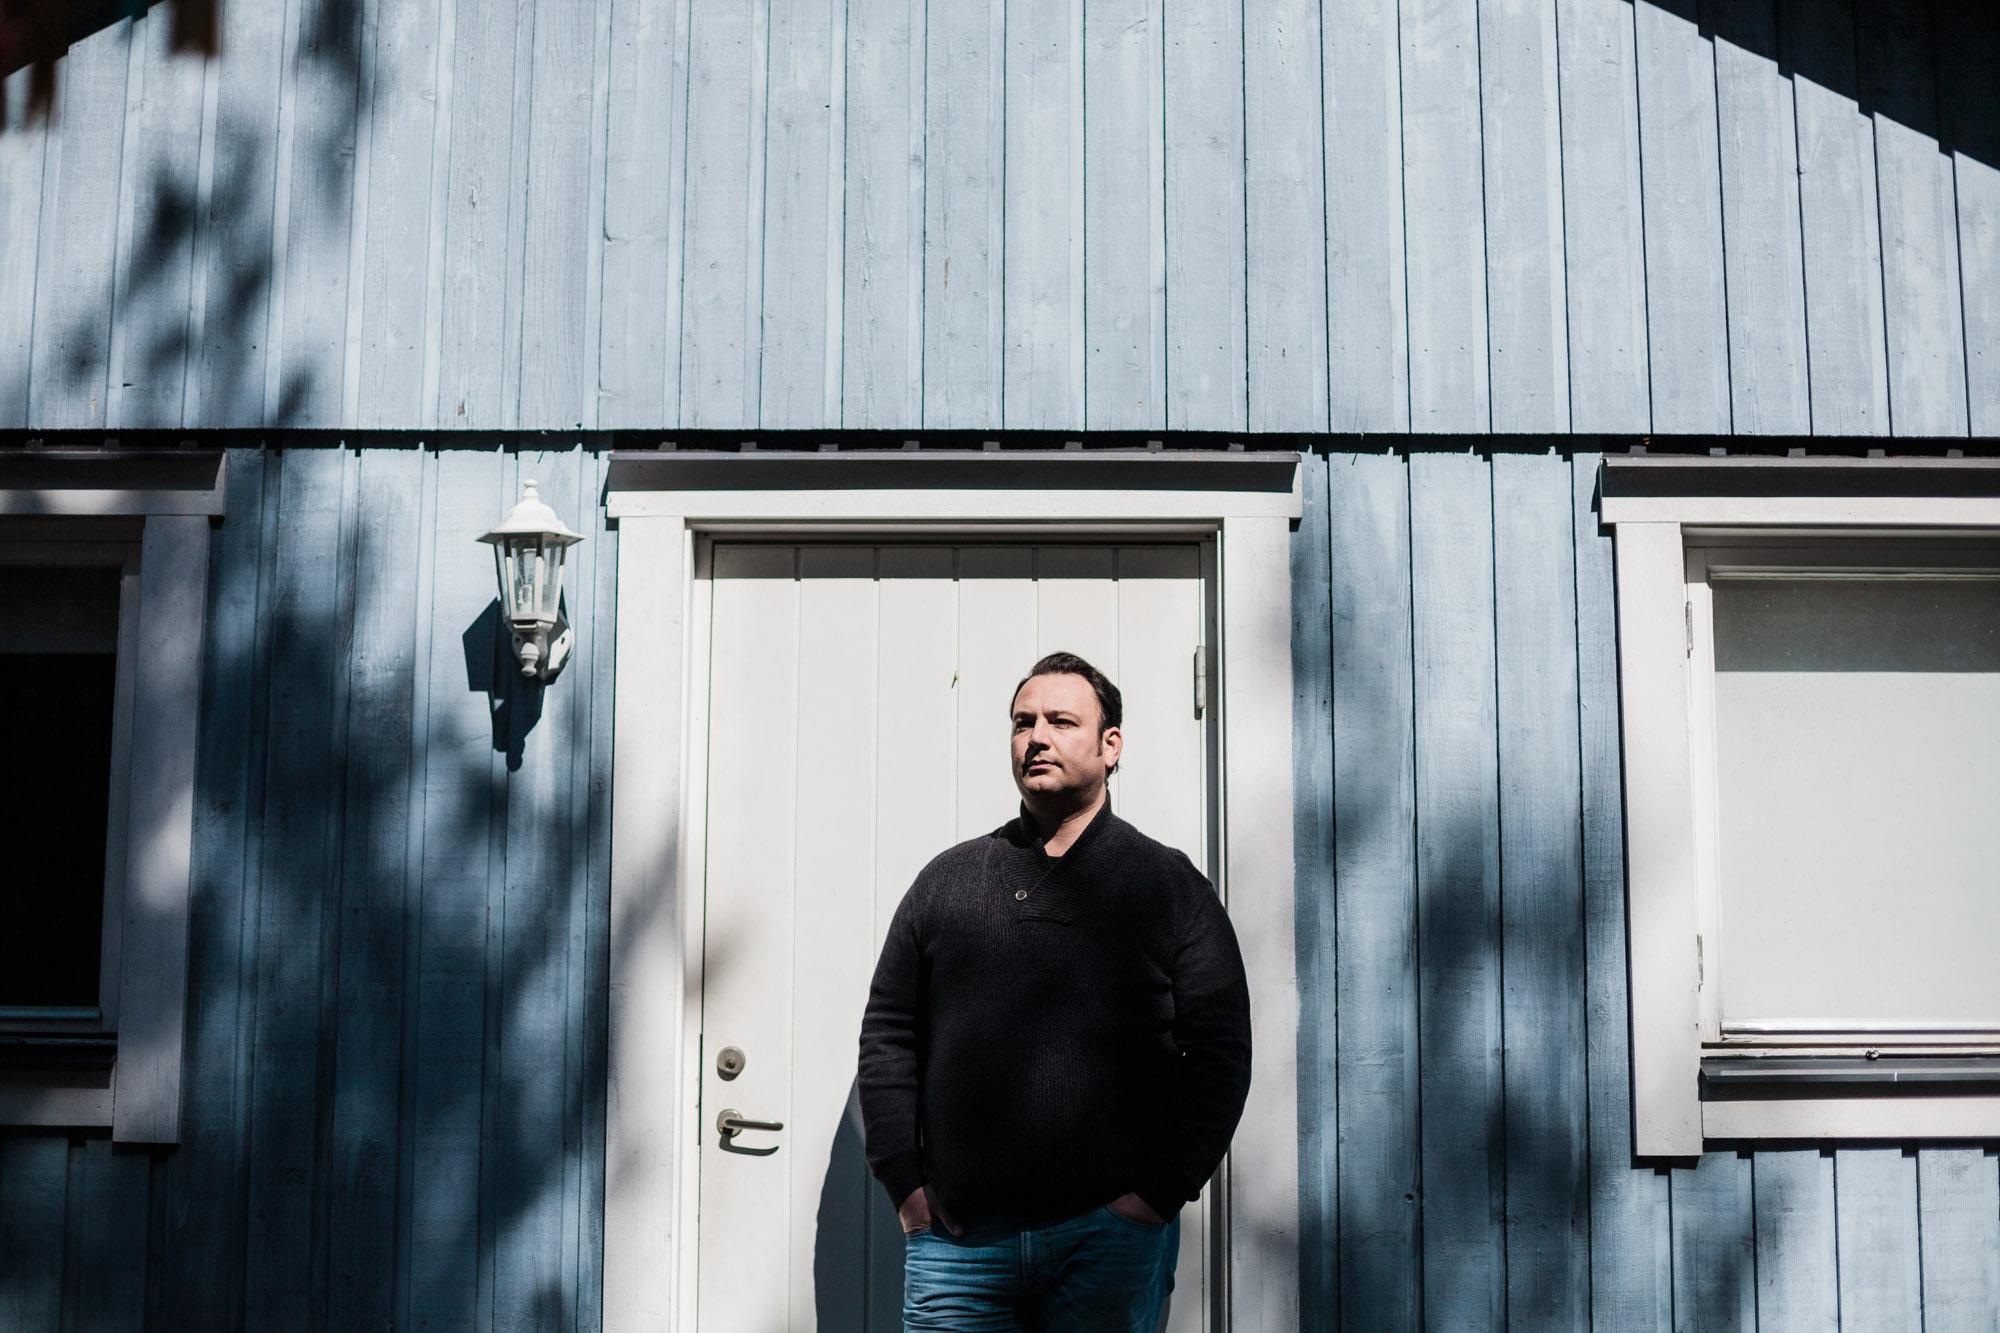 Portrait de Mansour Al-Omari, journaliste syrien refugie en Suede